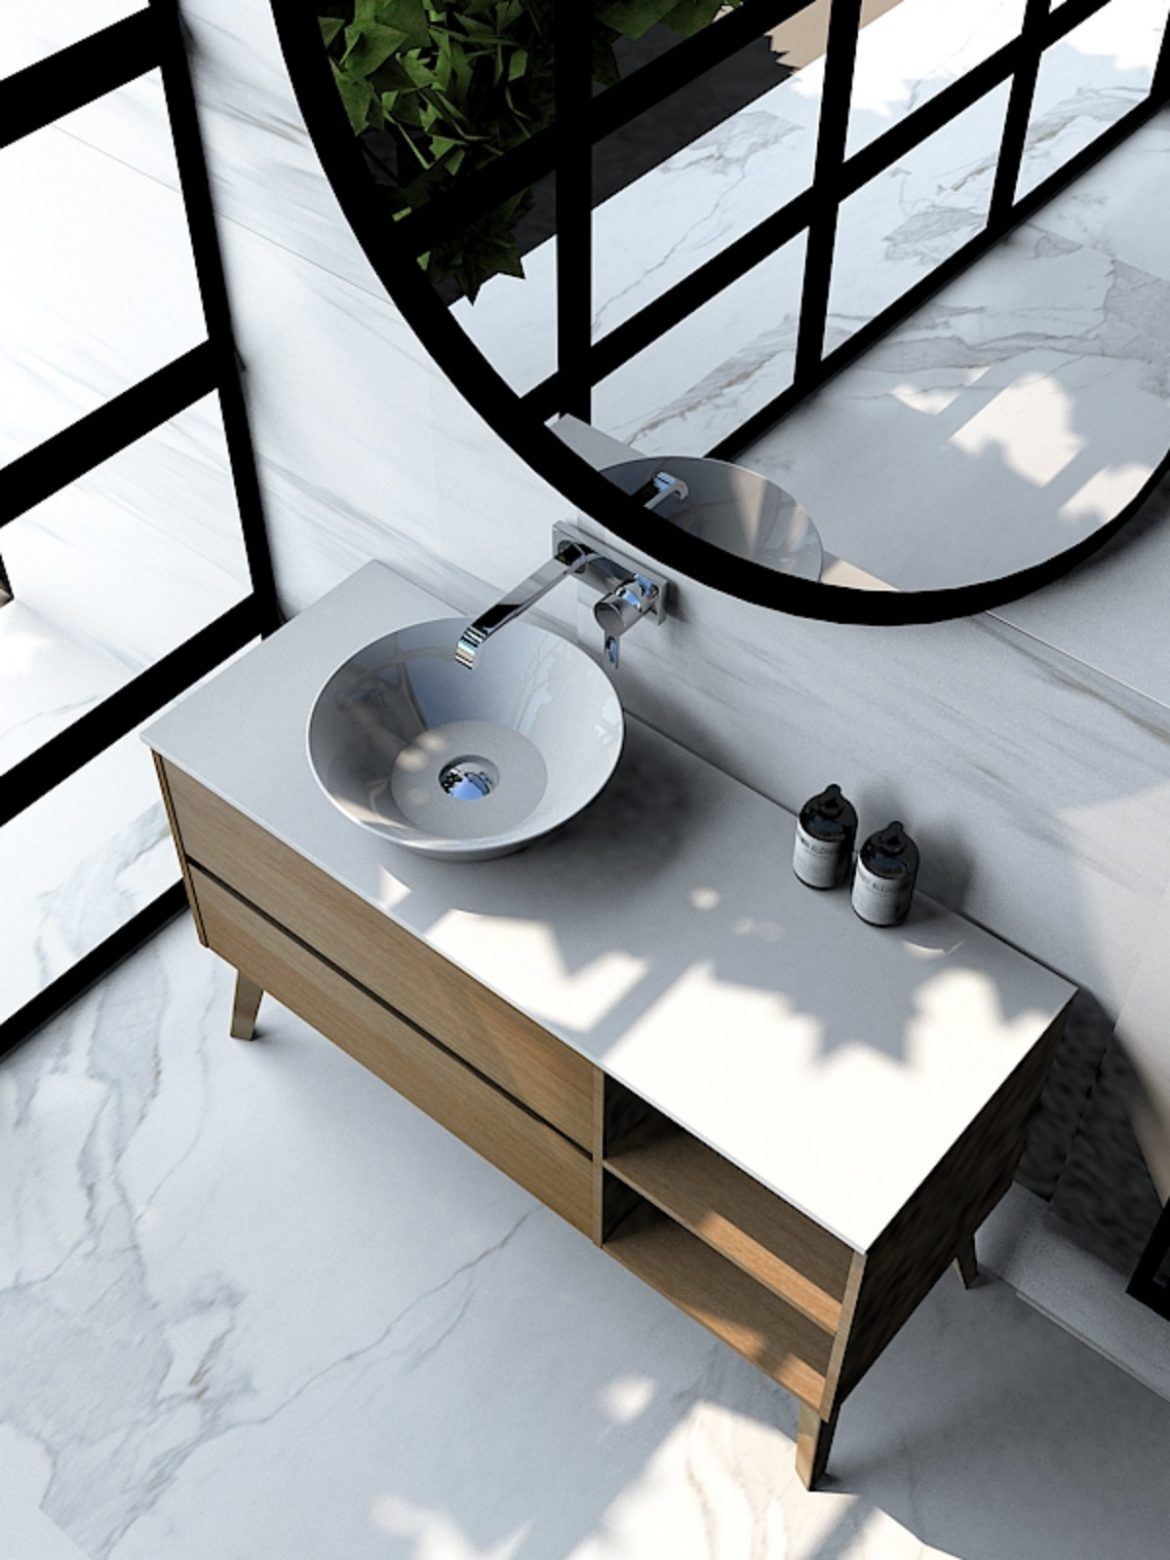 Espejos Redondos Lavabo.Espejos De Bano Que Agrandan Decoran Iluminan Codis Bath